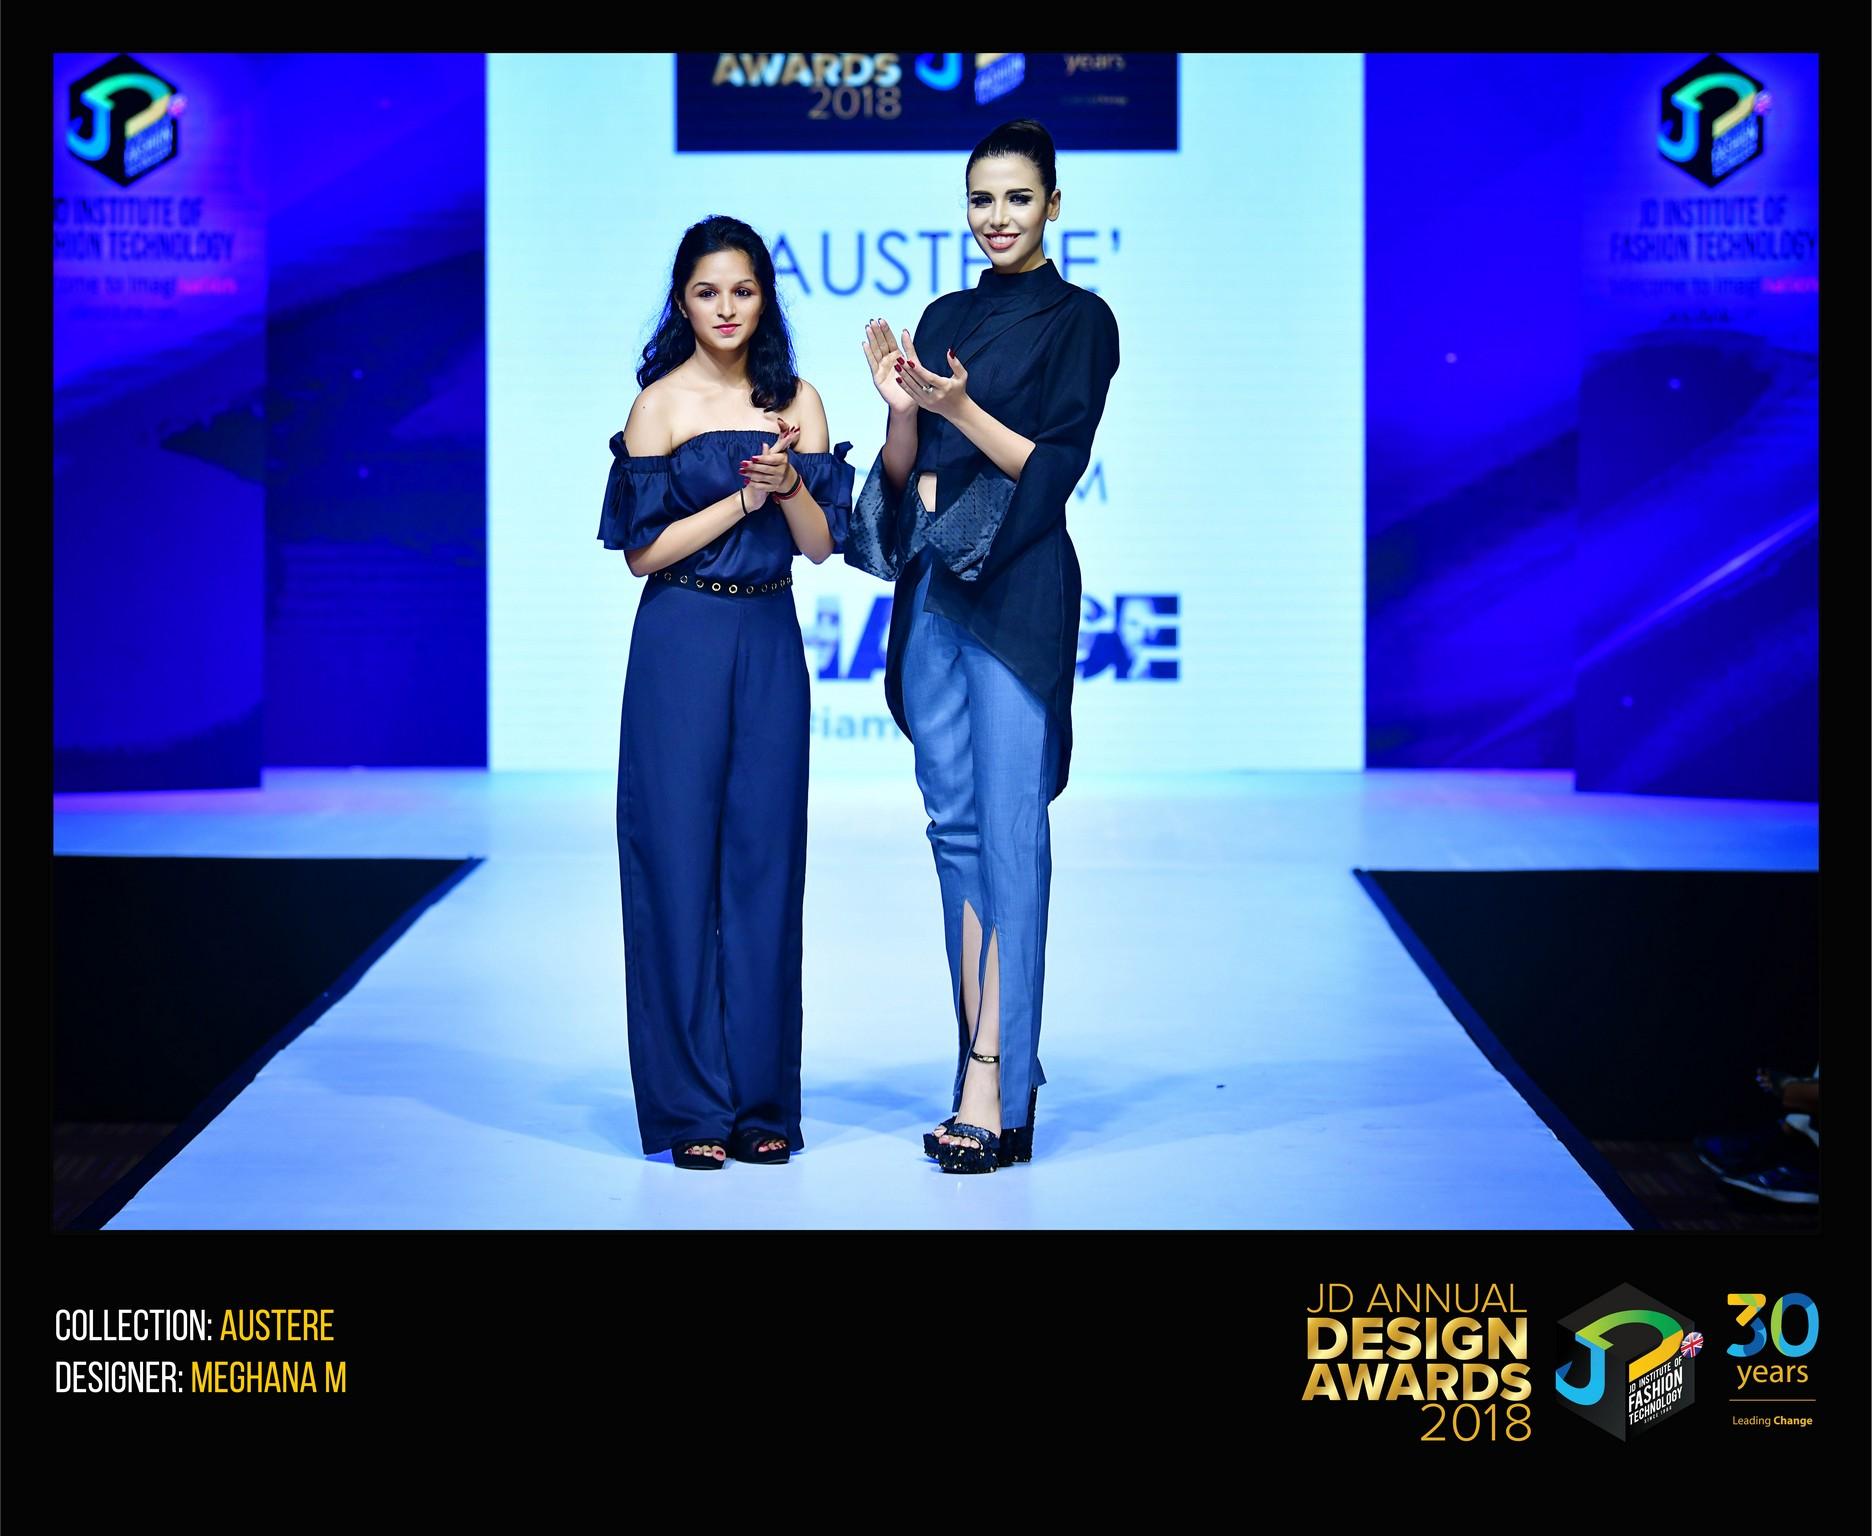 Austere – Change – JD Annual Design Awards 2018 | Designer: Meghana | Photography : Jerin Nath (@jerin_nath) austere - AUSTERE9 final - Austere – Change – JD Annual Design Awards 2018